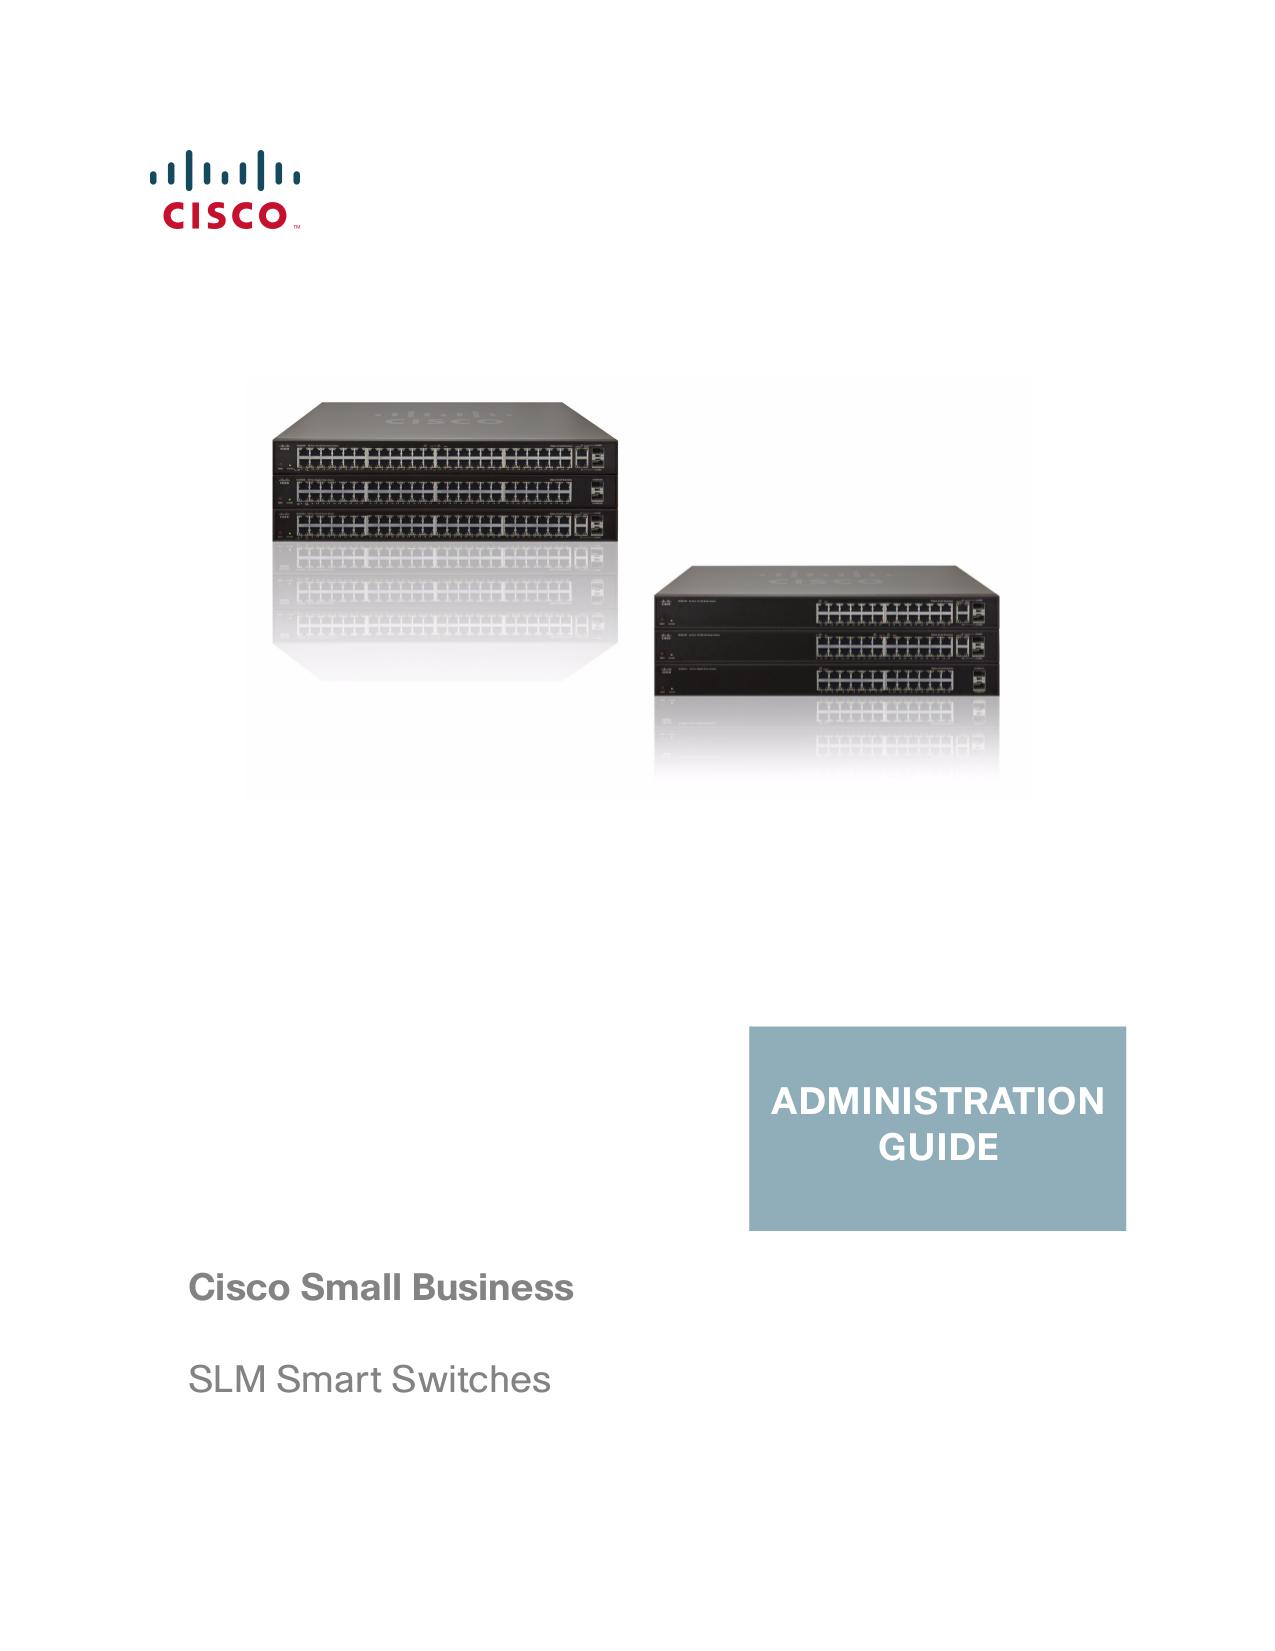 pdf for Linksys Switch SLM2024 manual